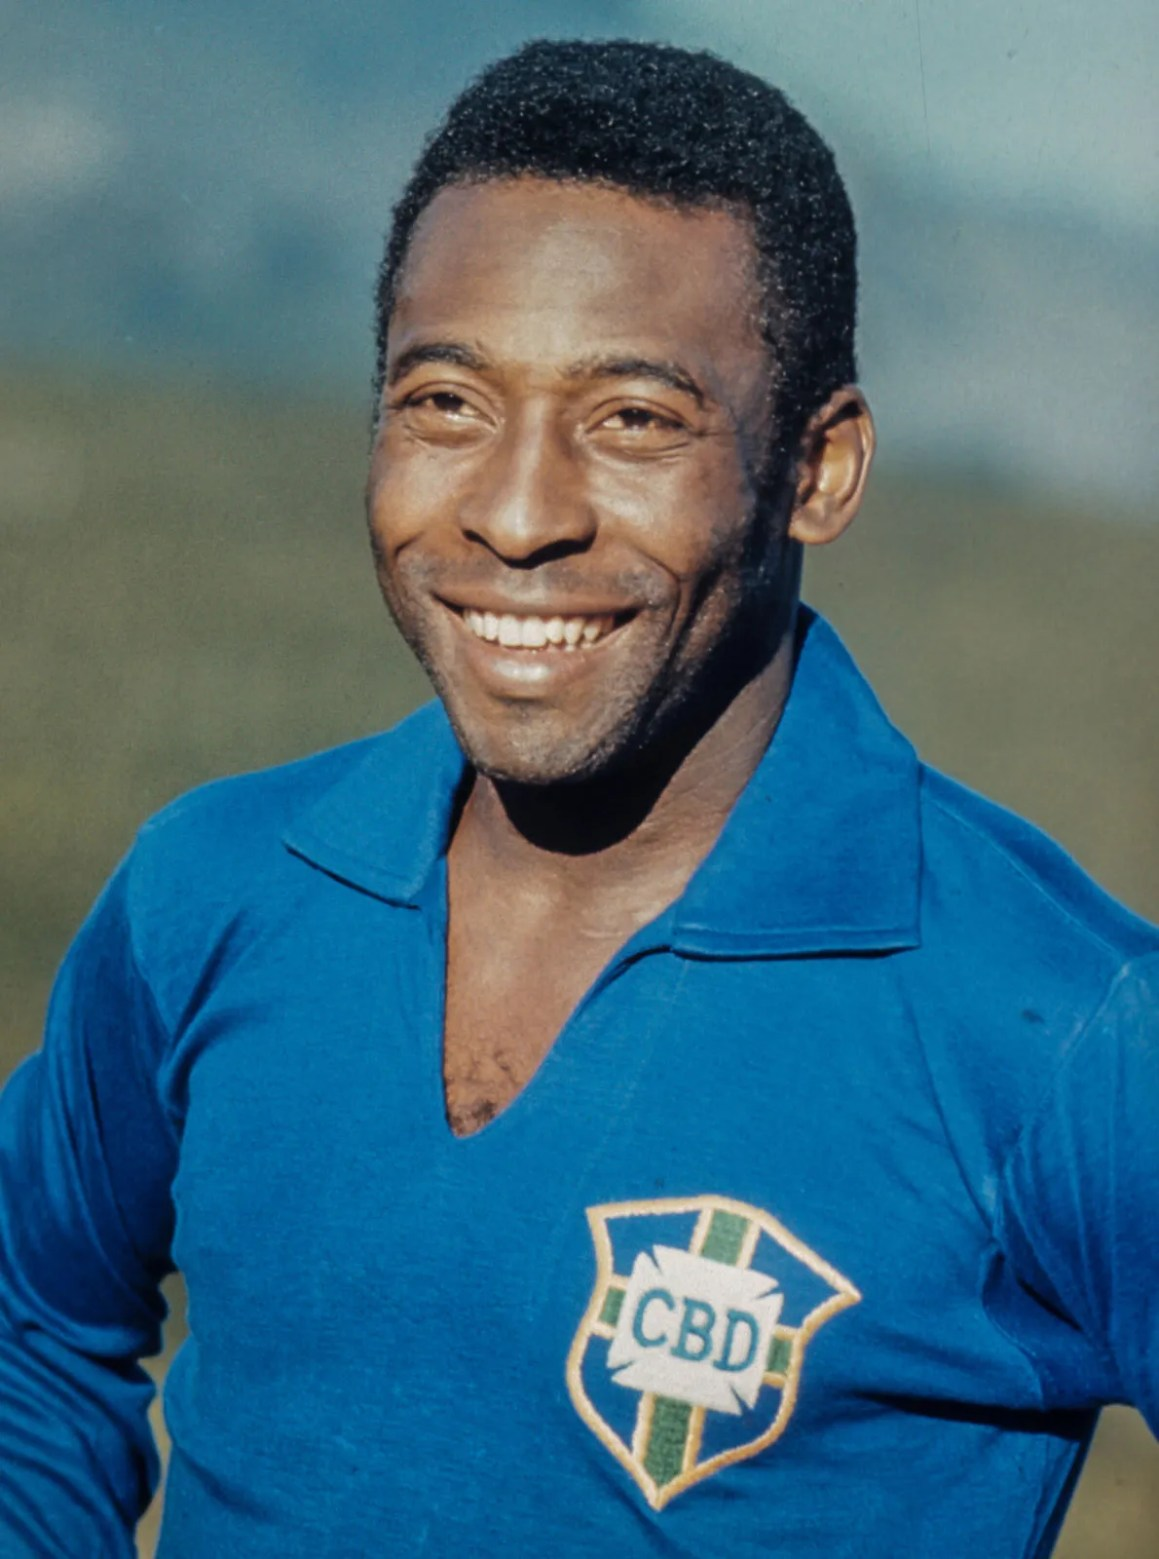 Pele | Biography, World Cups, & Facts | Britannica